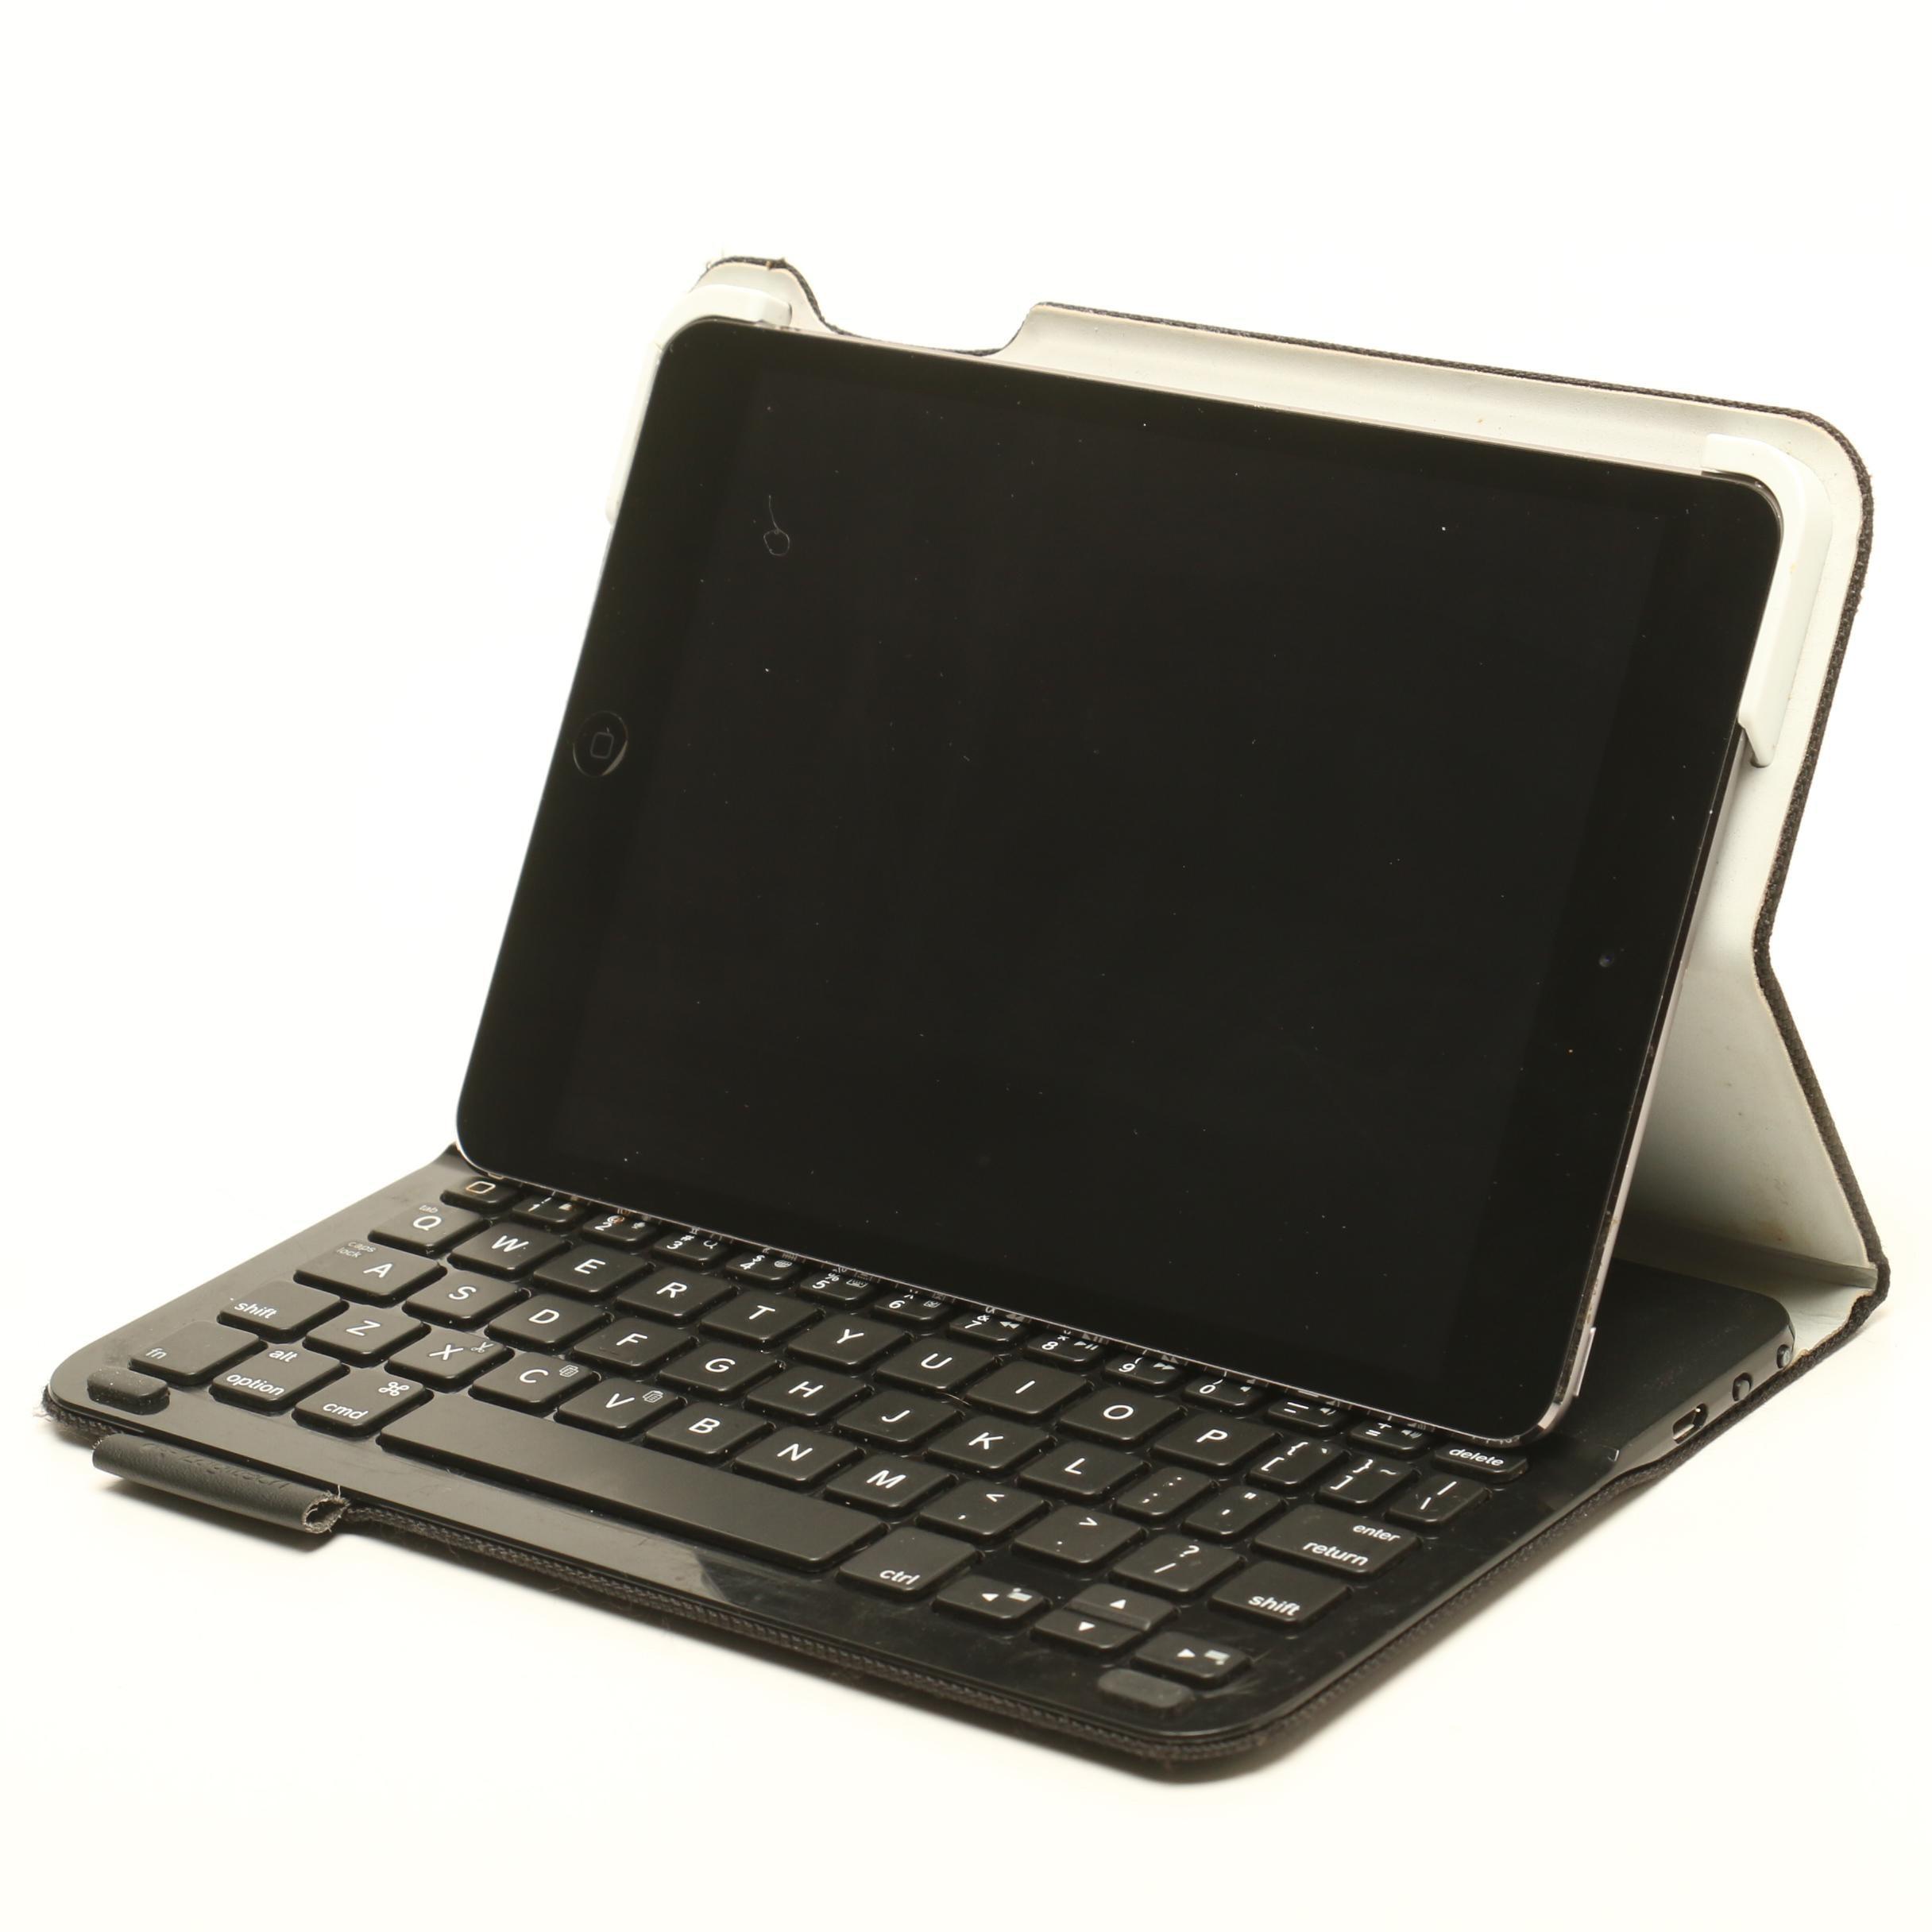 Apple iPad with Keyboard, Model A 1489